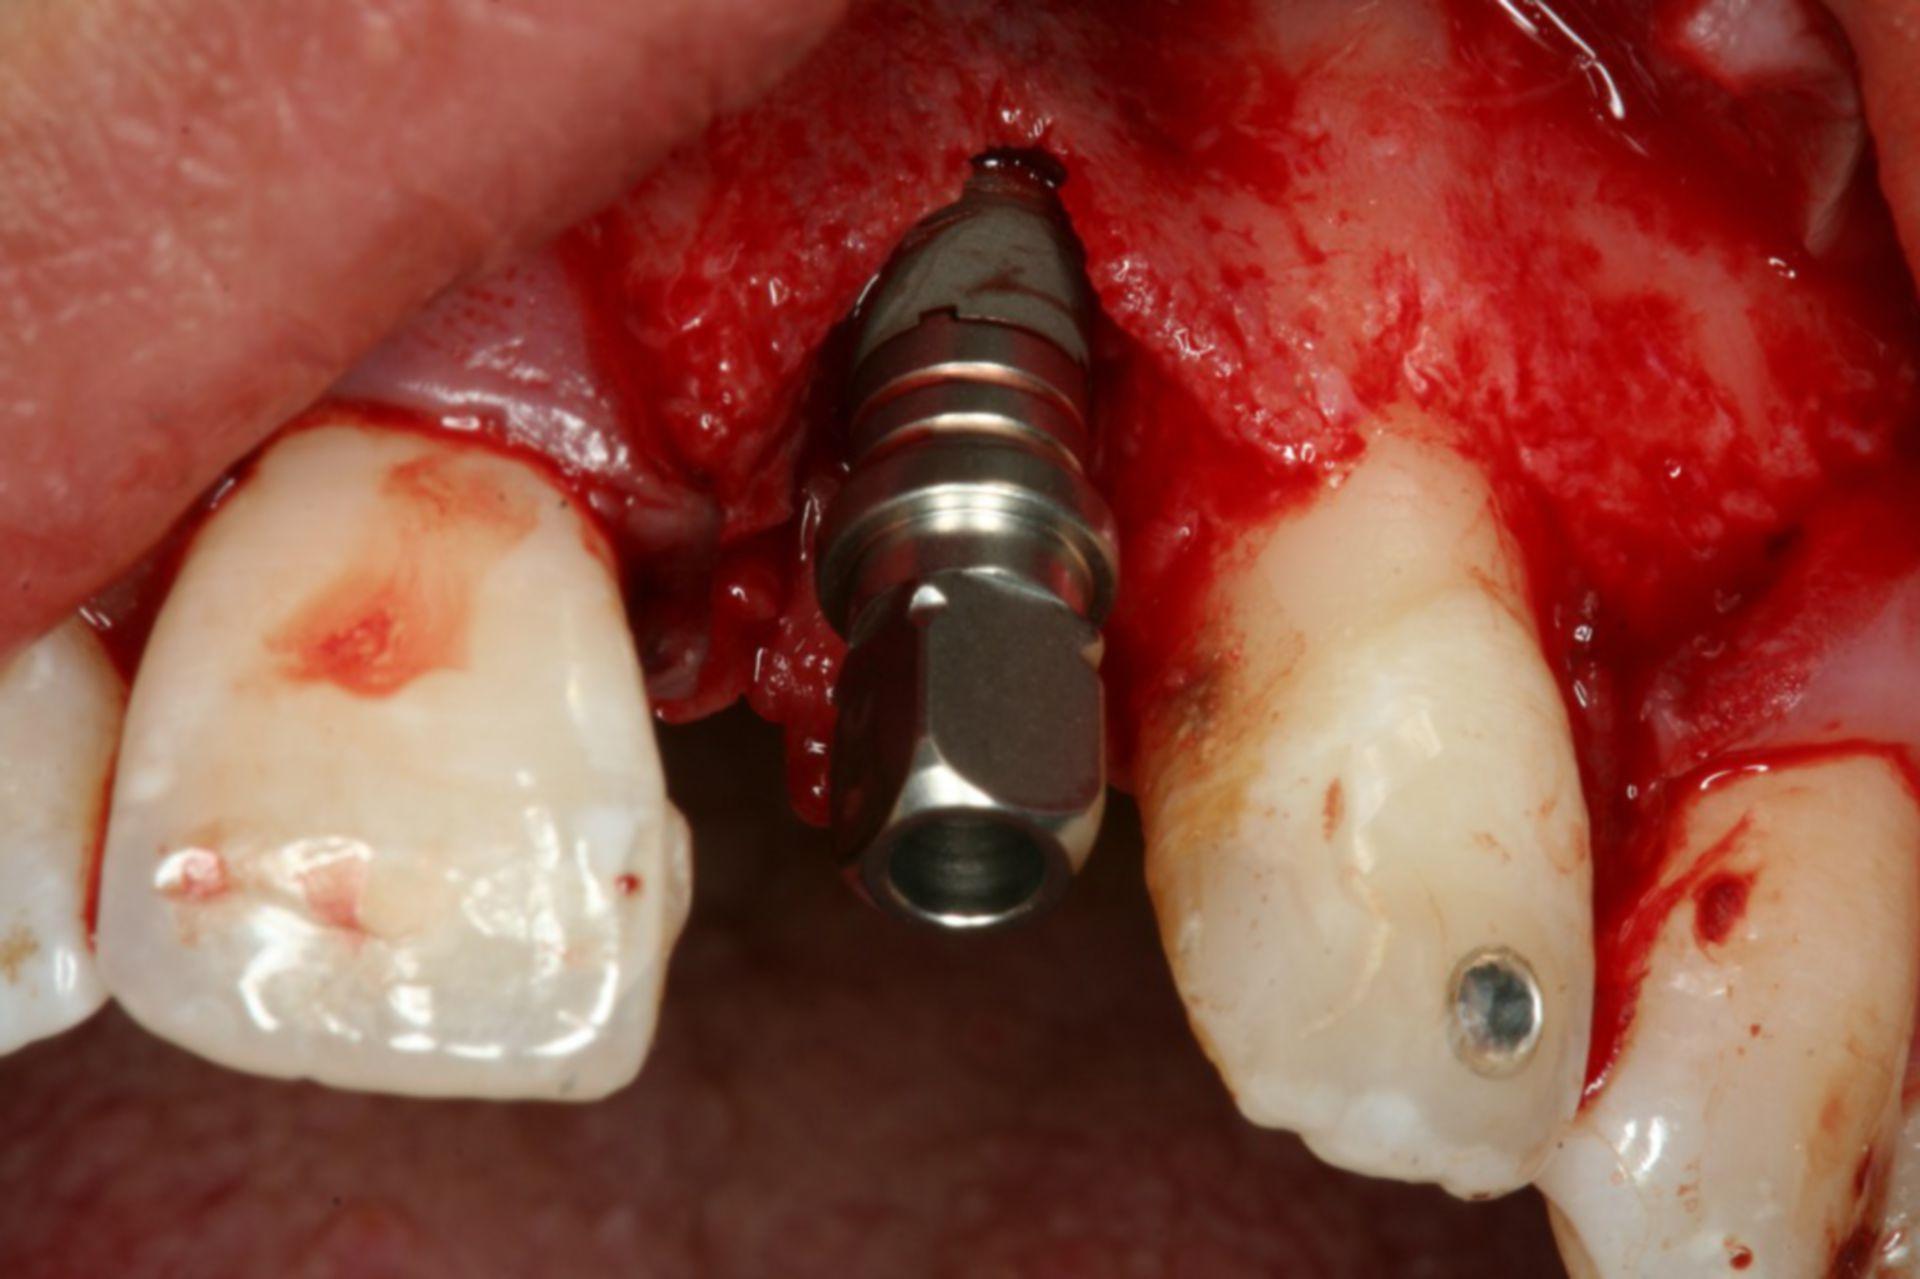 Vite inpianto dentale